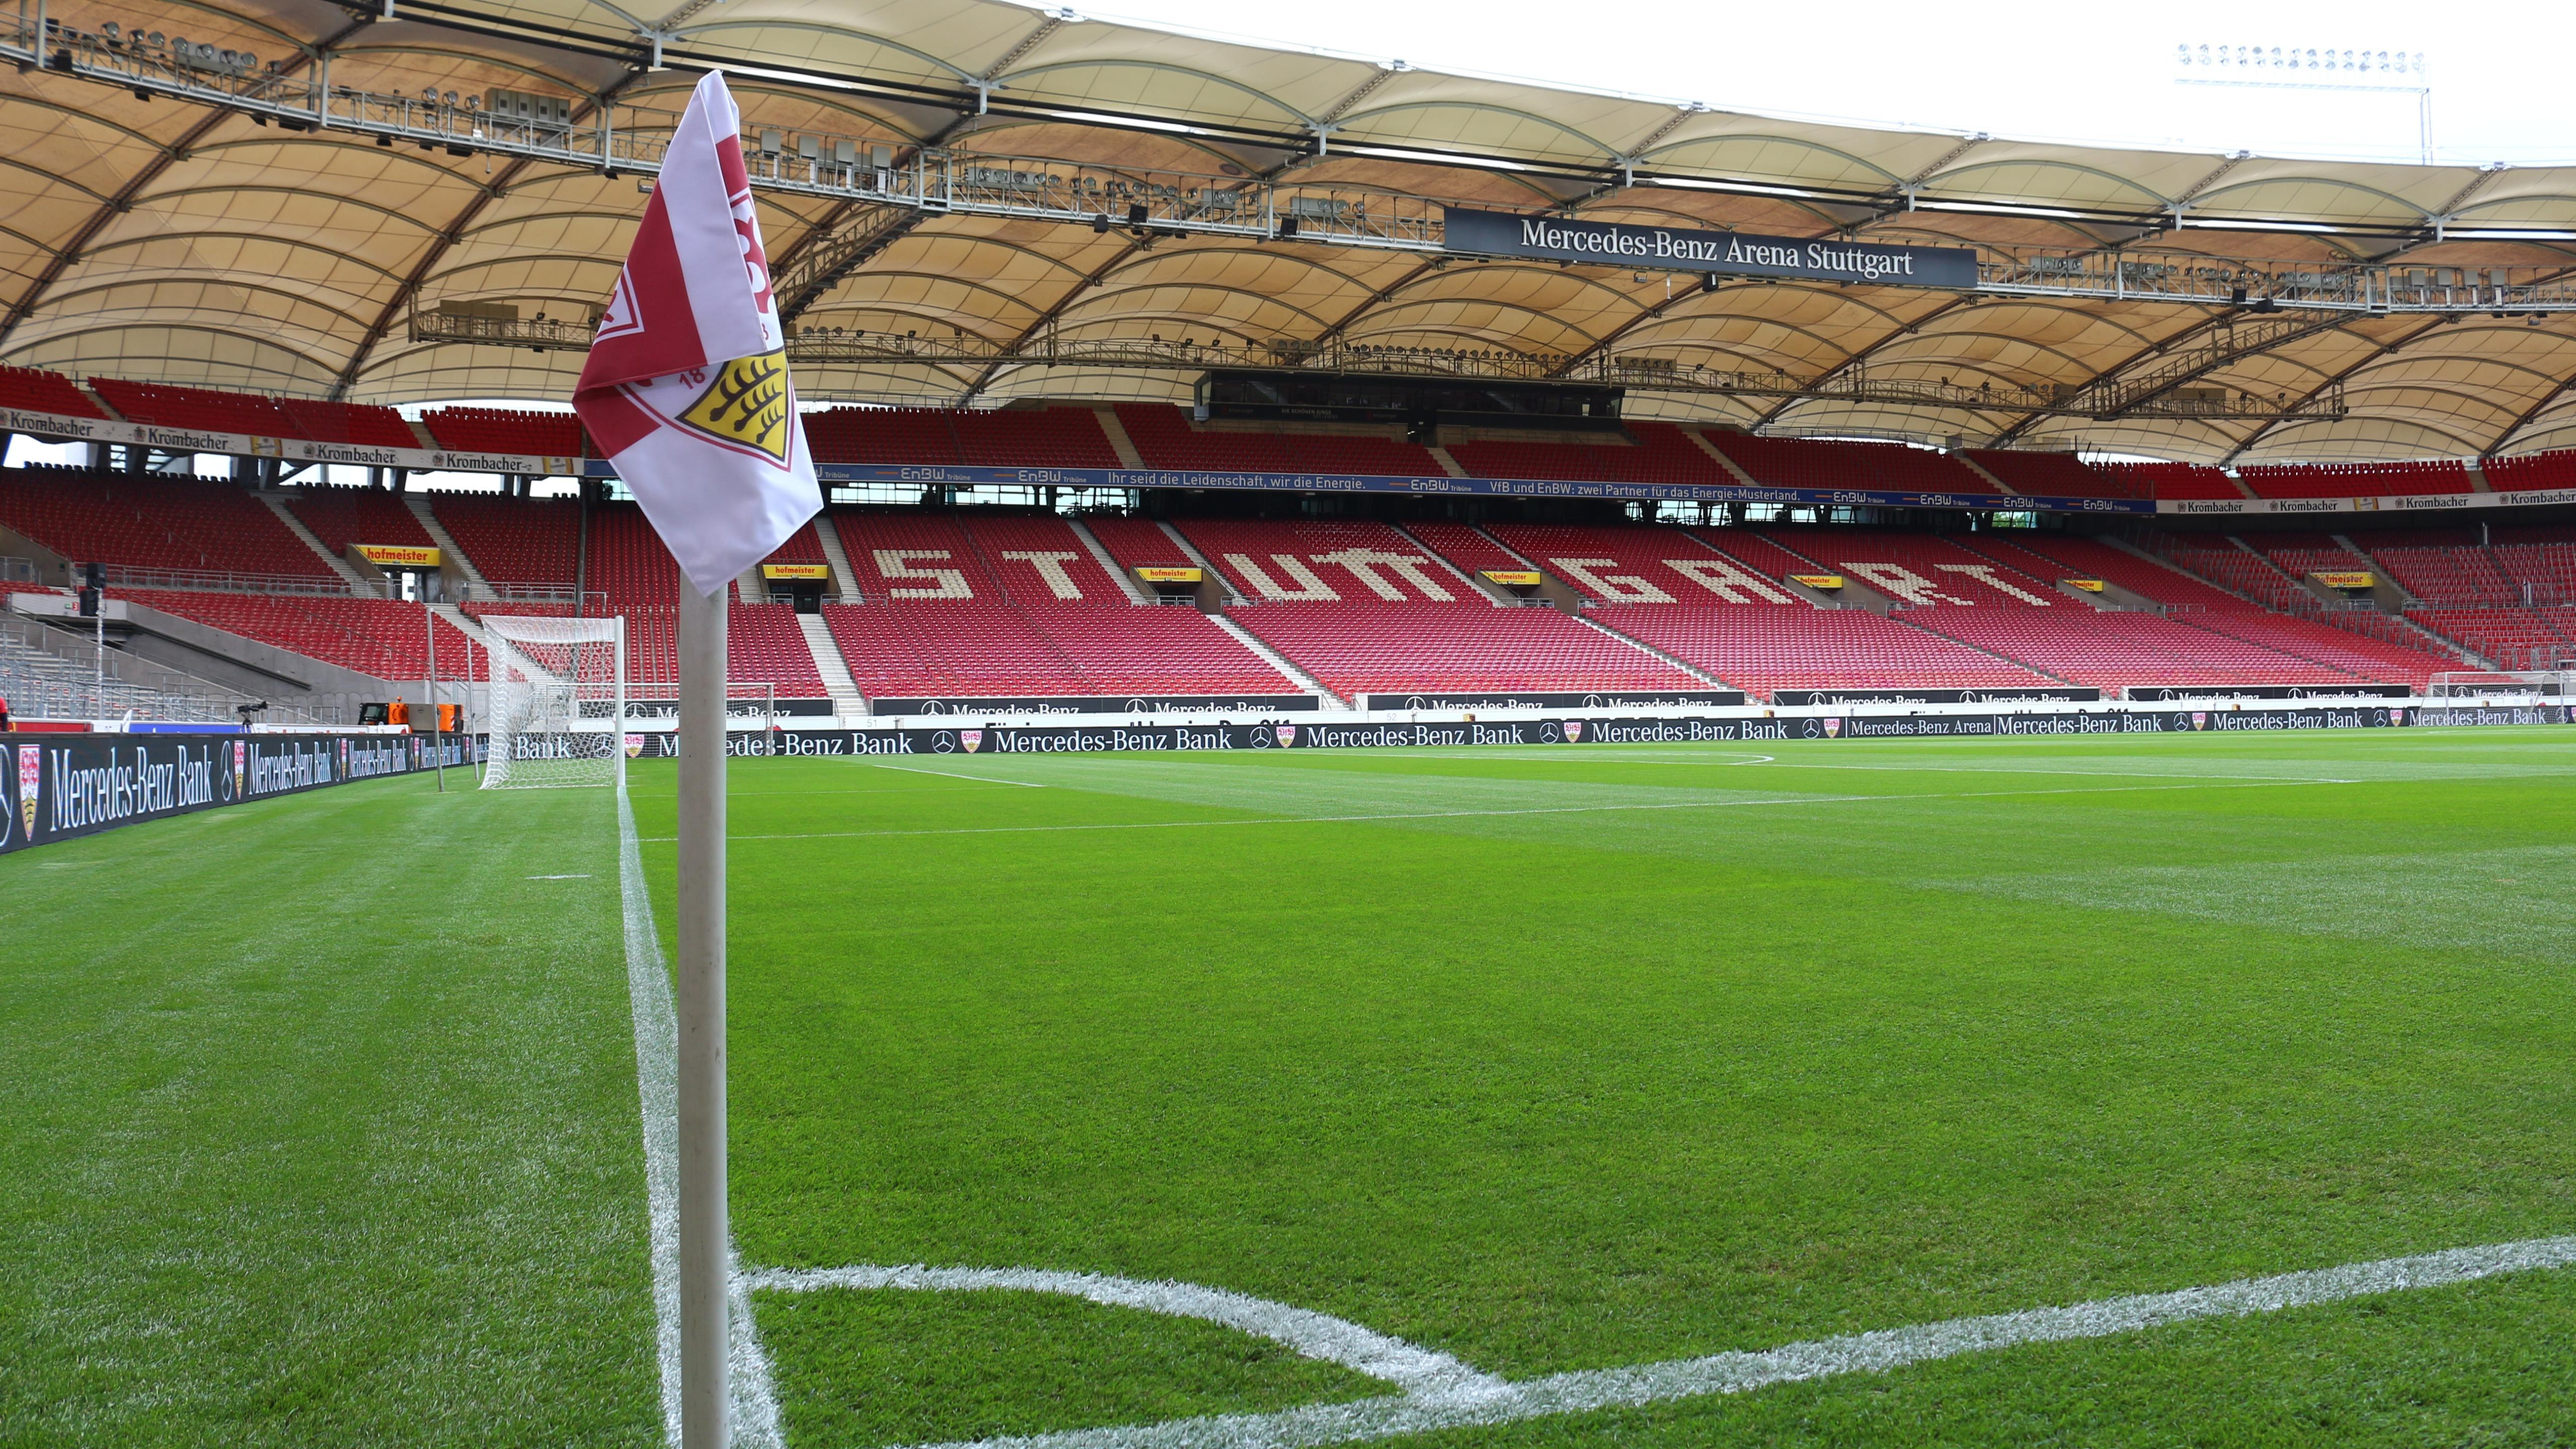 Field at Mercedes-Benz Arena in Stuttgart wallpaper